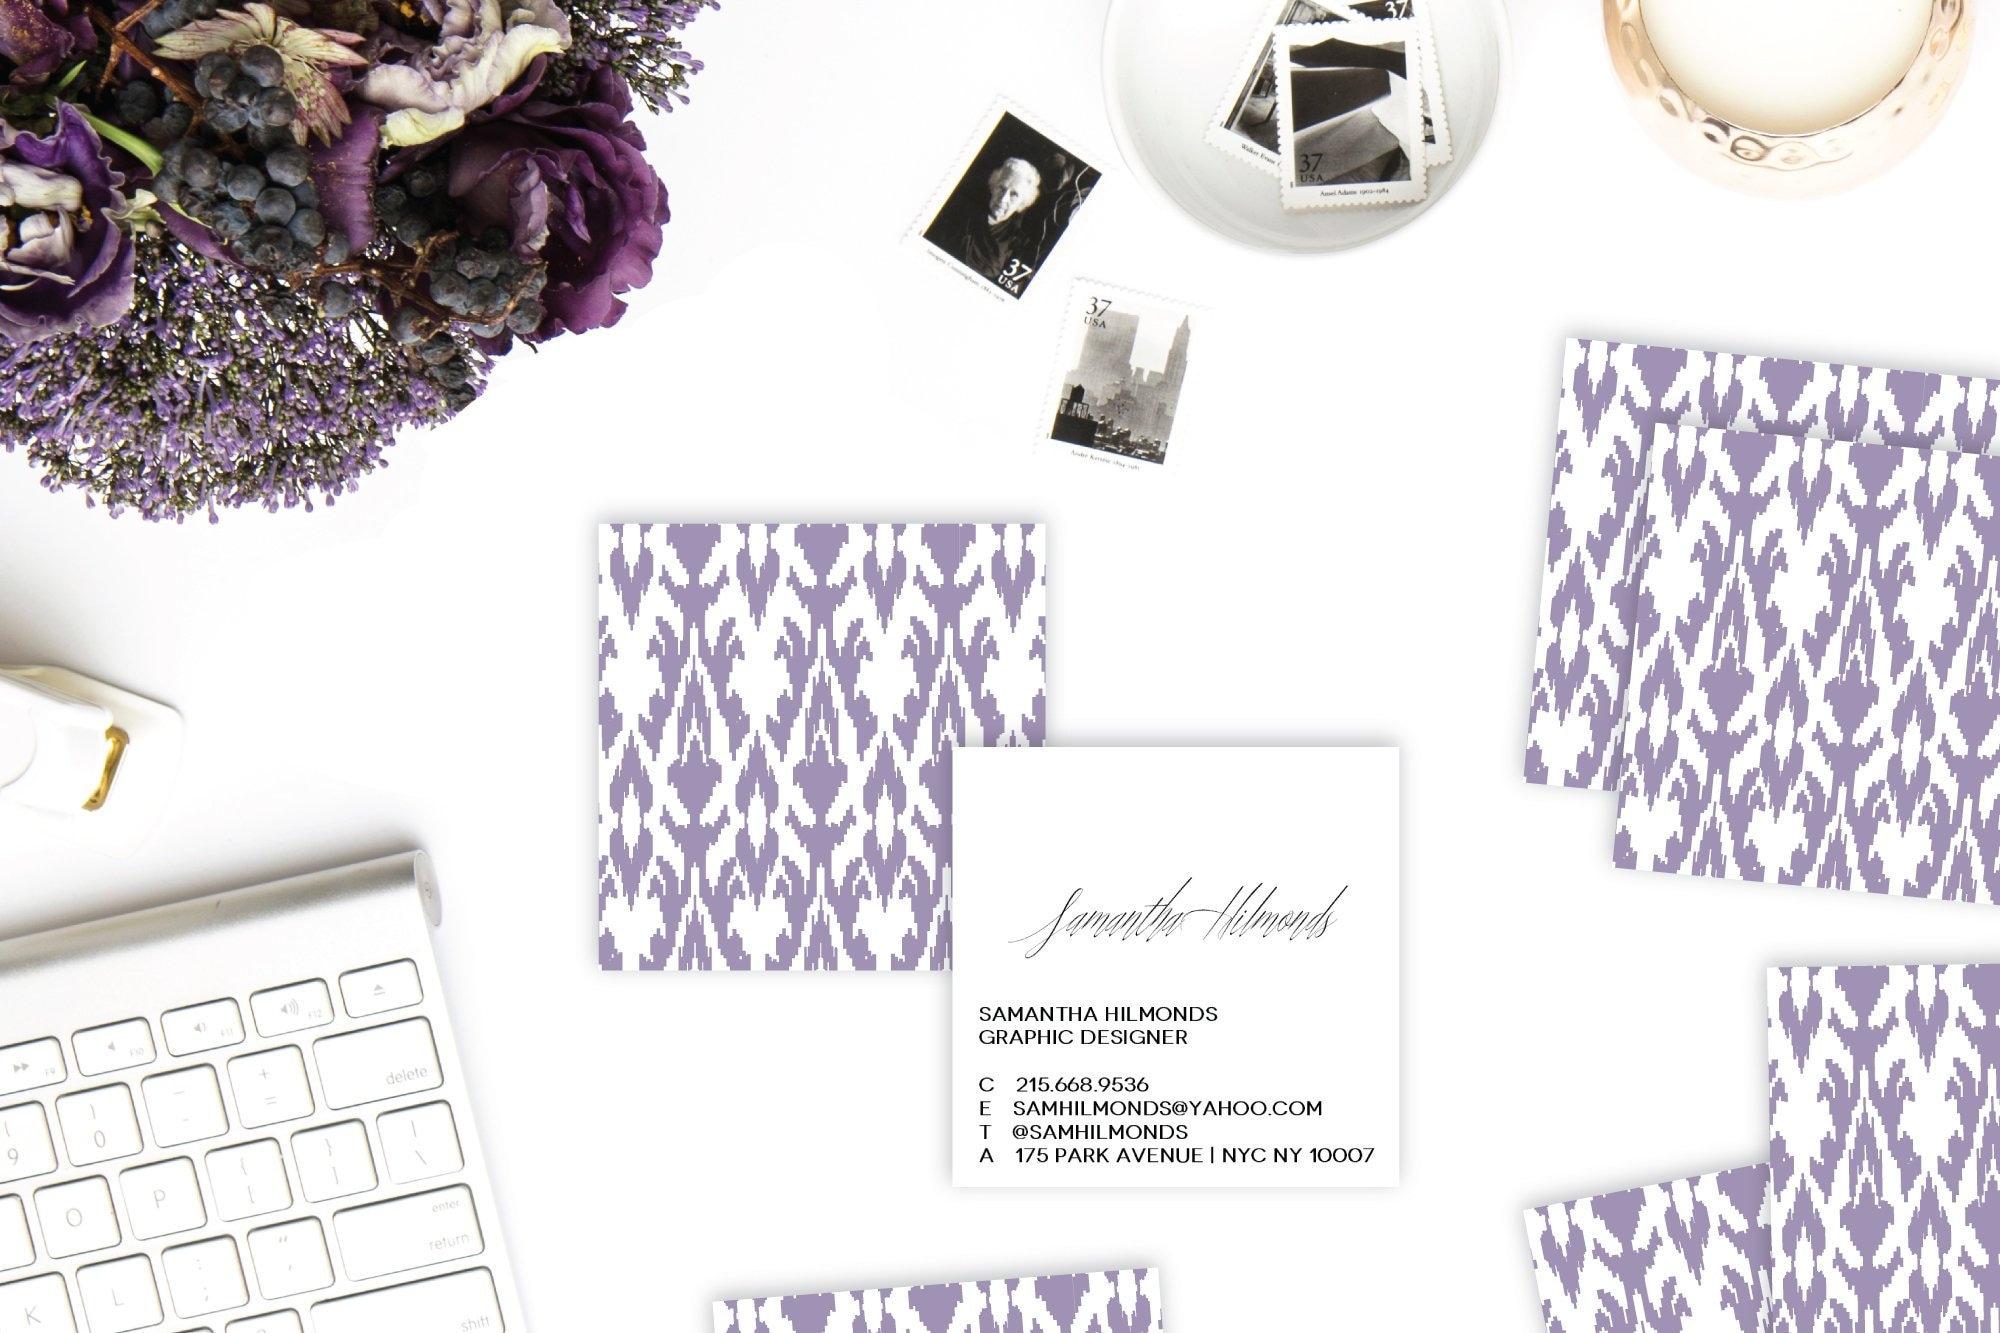 Ikat Calling Cards / Business Cards / Blogger Cards - Set (50)